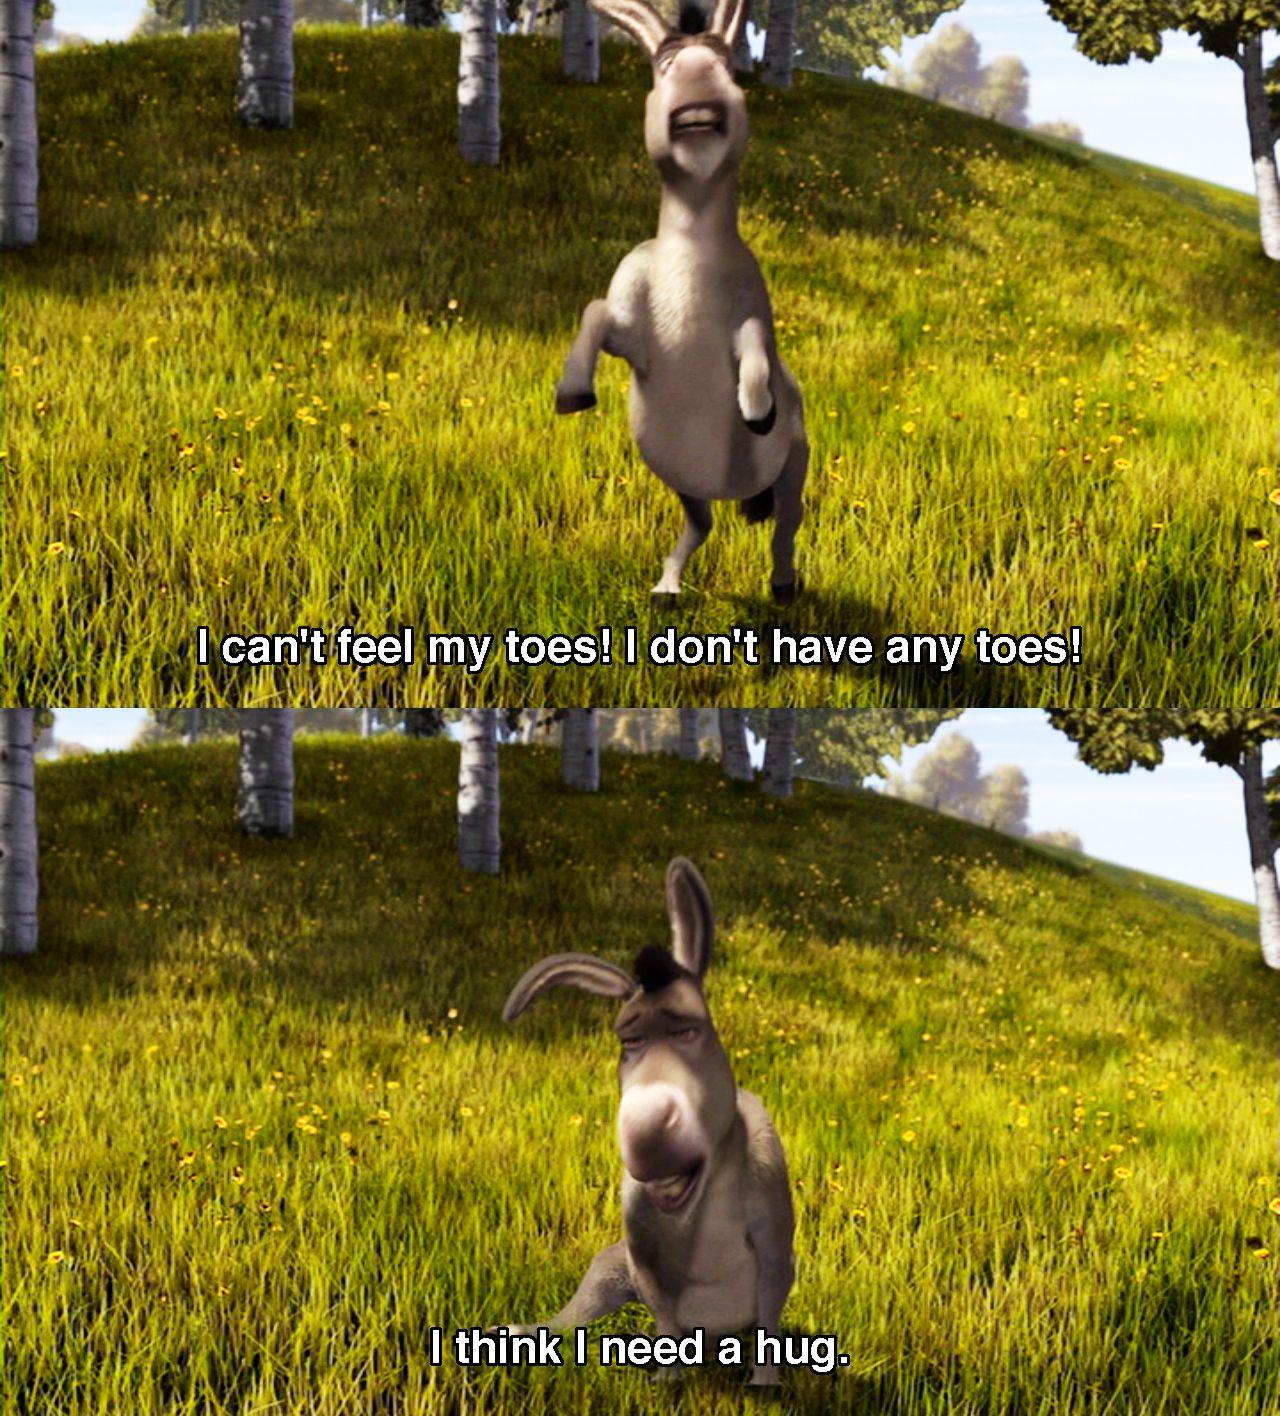 Donkey I Can T Feel My Toes I Don T Have Any Toes I Think I Need A Hug Donkey S Funny Line From Shrek Shrek Quotes Shrek Animated Movies